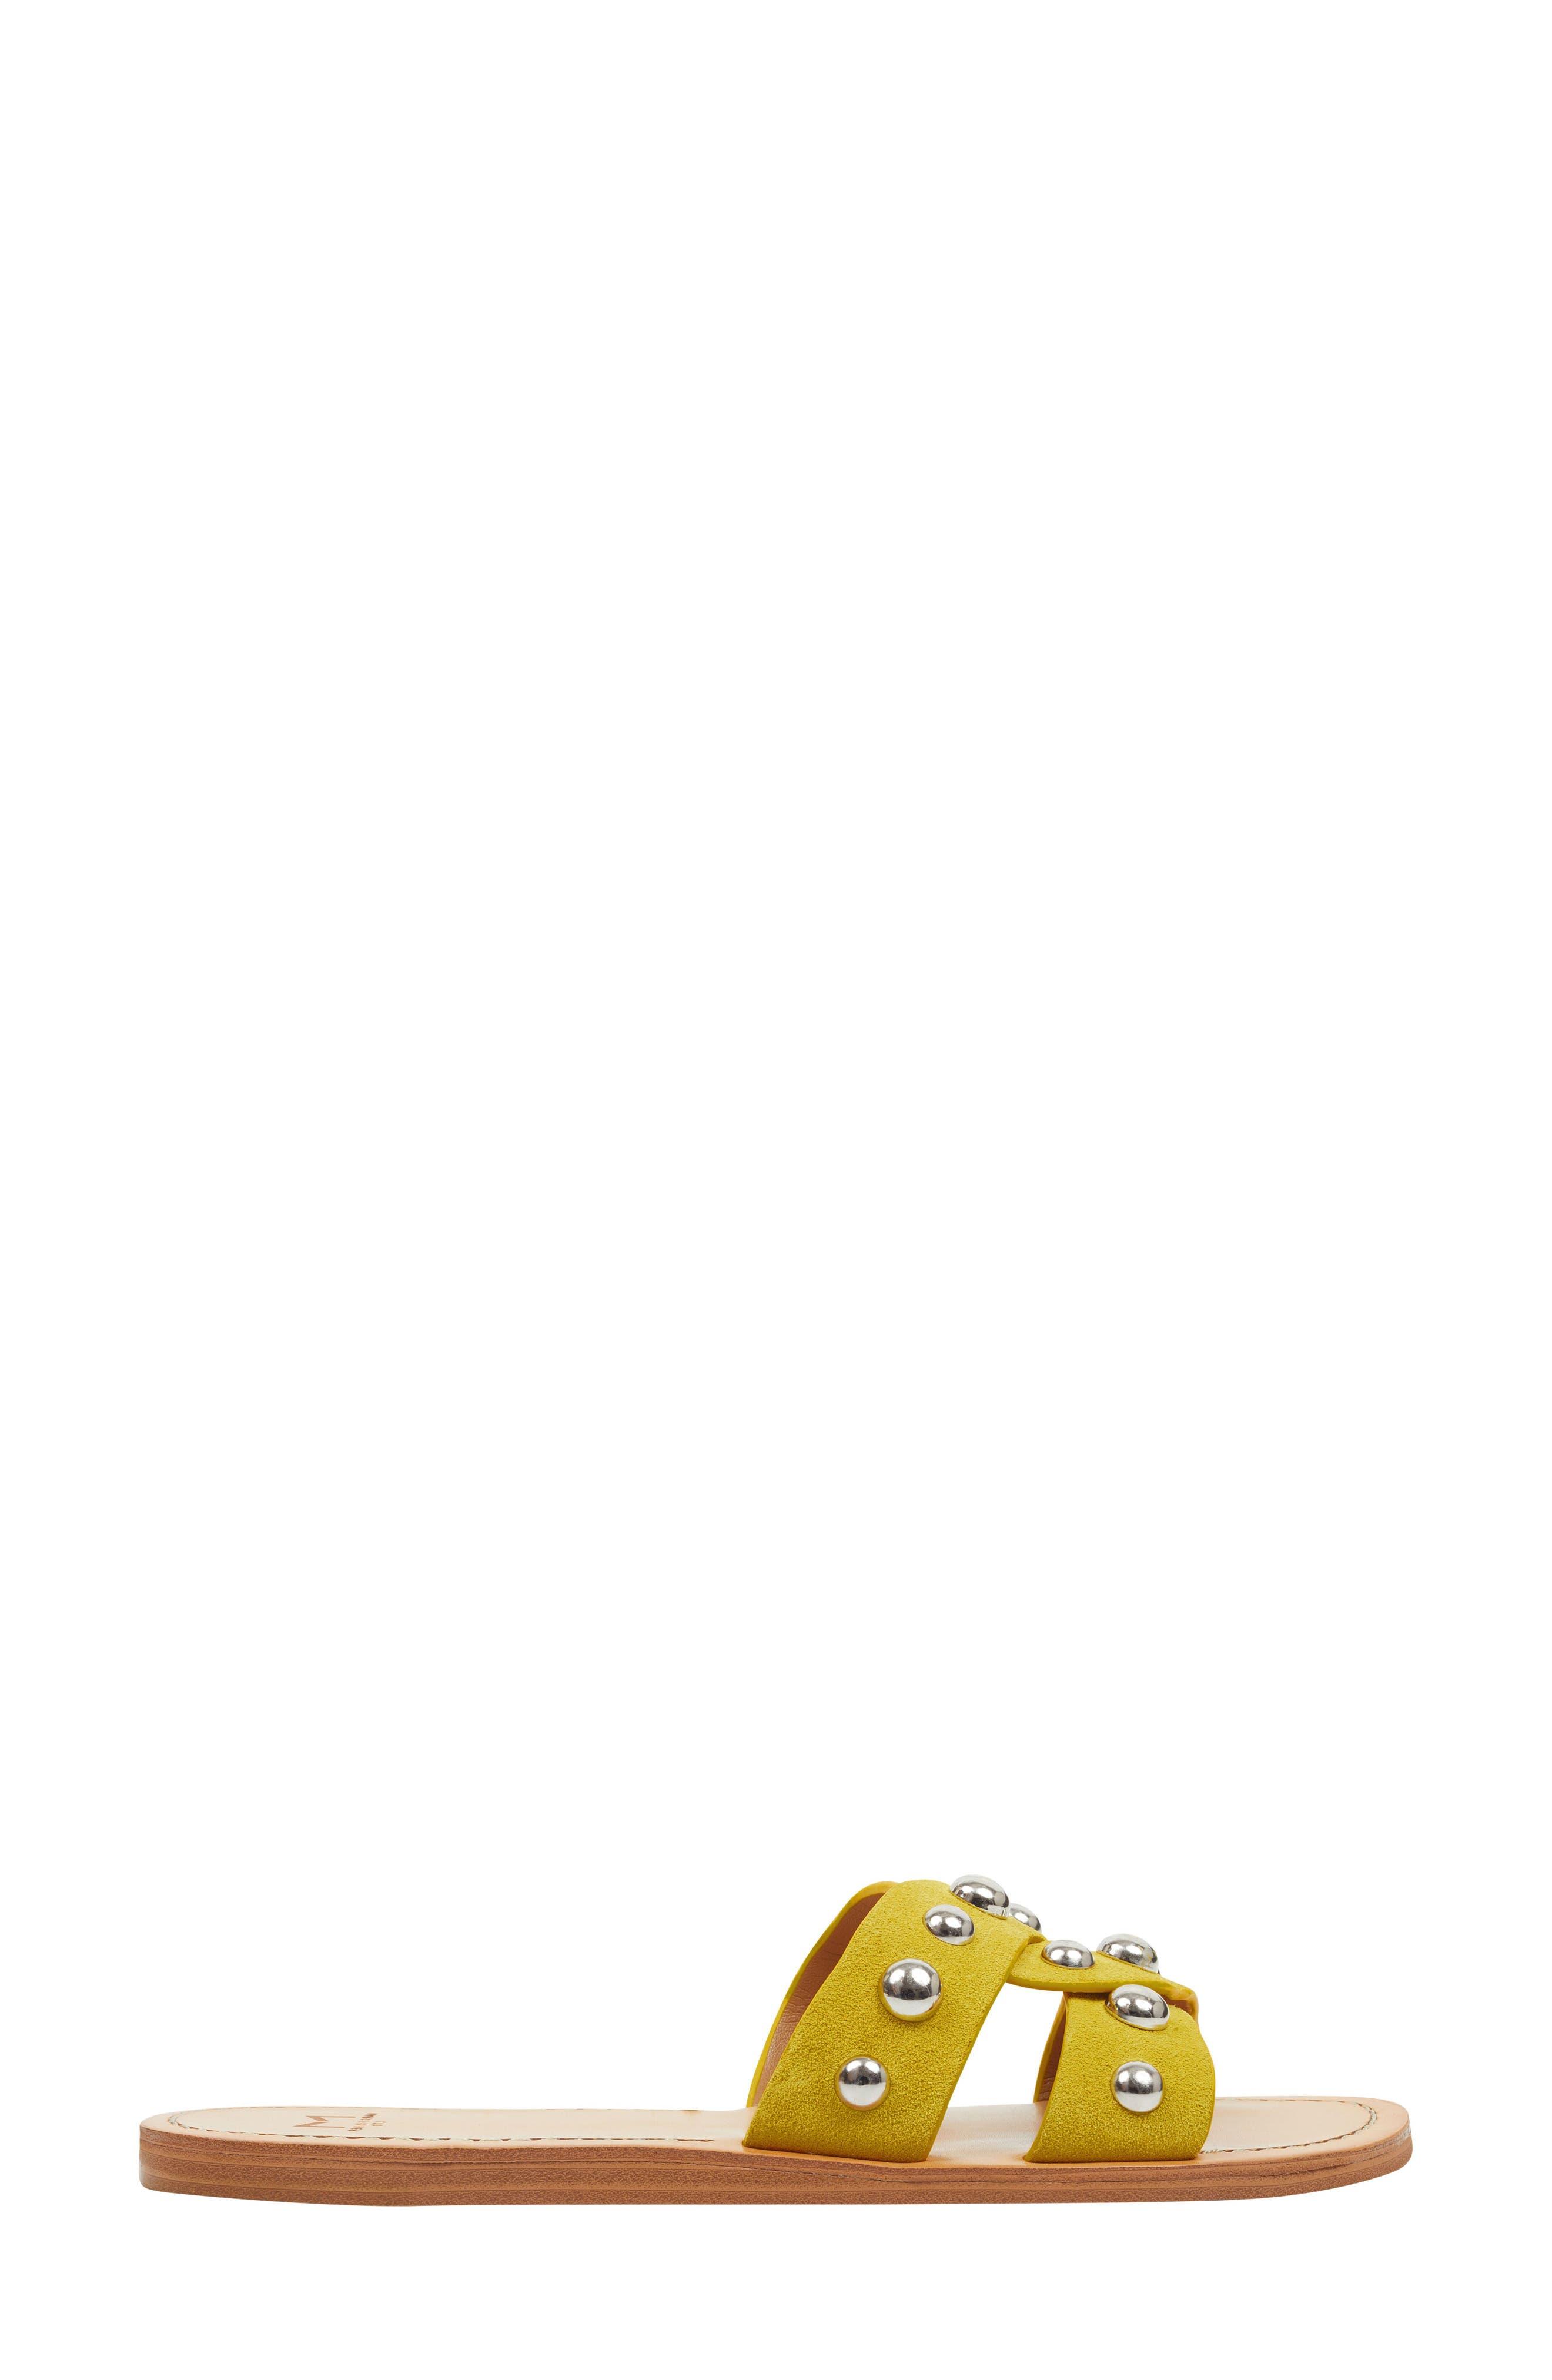 MARC FISHER LTD, Pagie Slide Sandal, Alternate thumbnail 3, color, YELLOW SUEDE